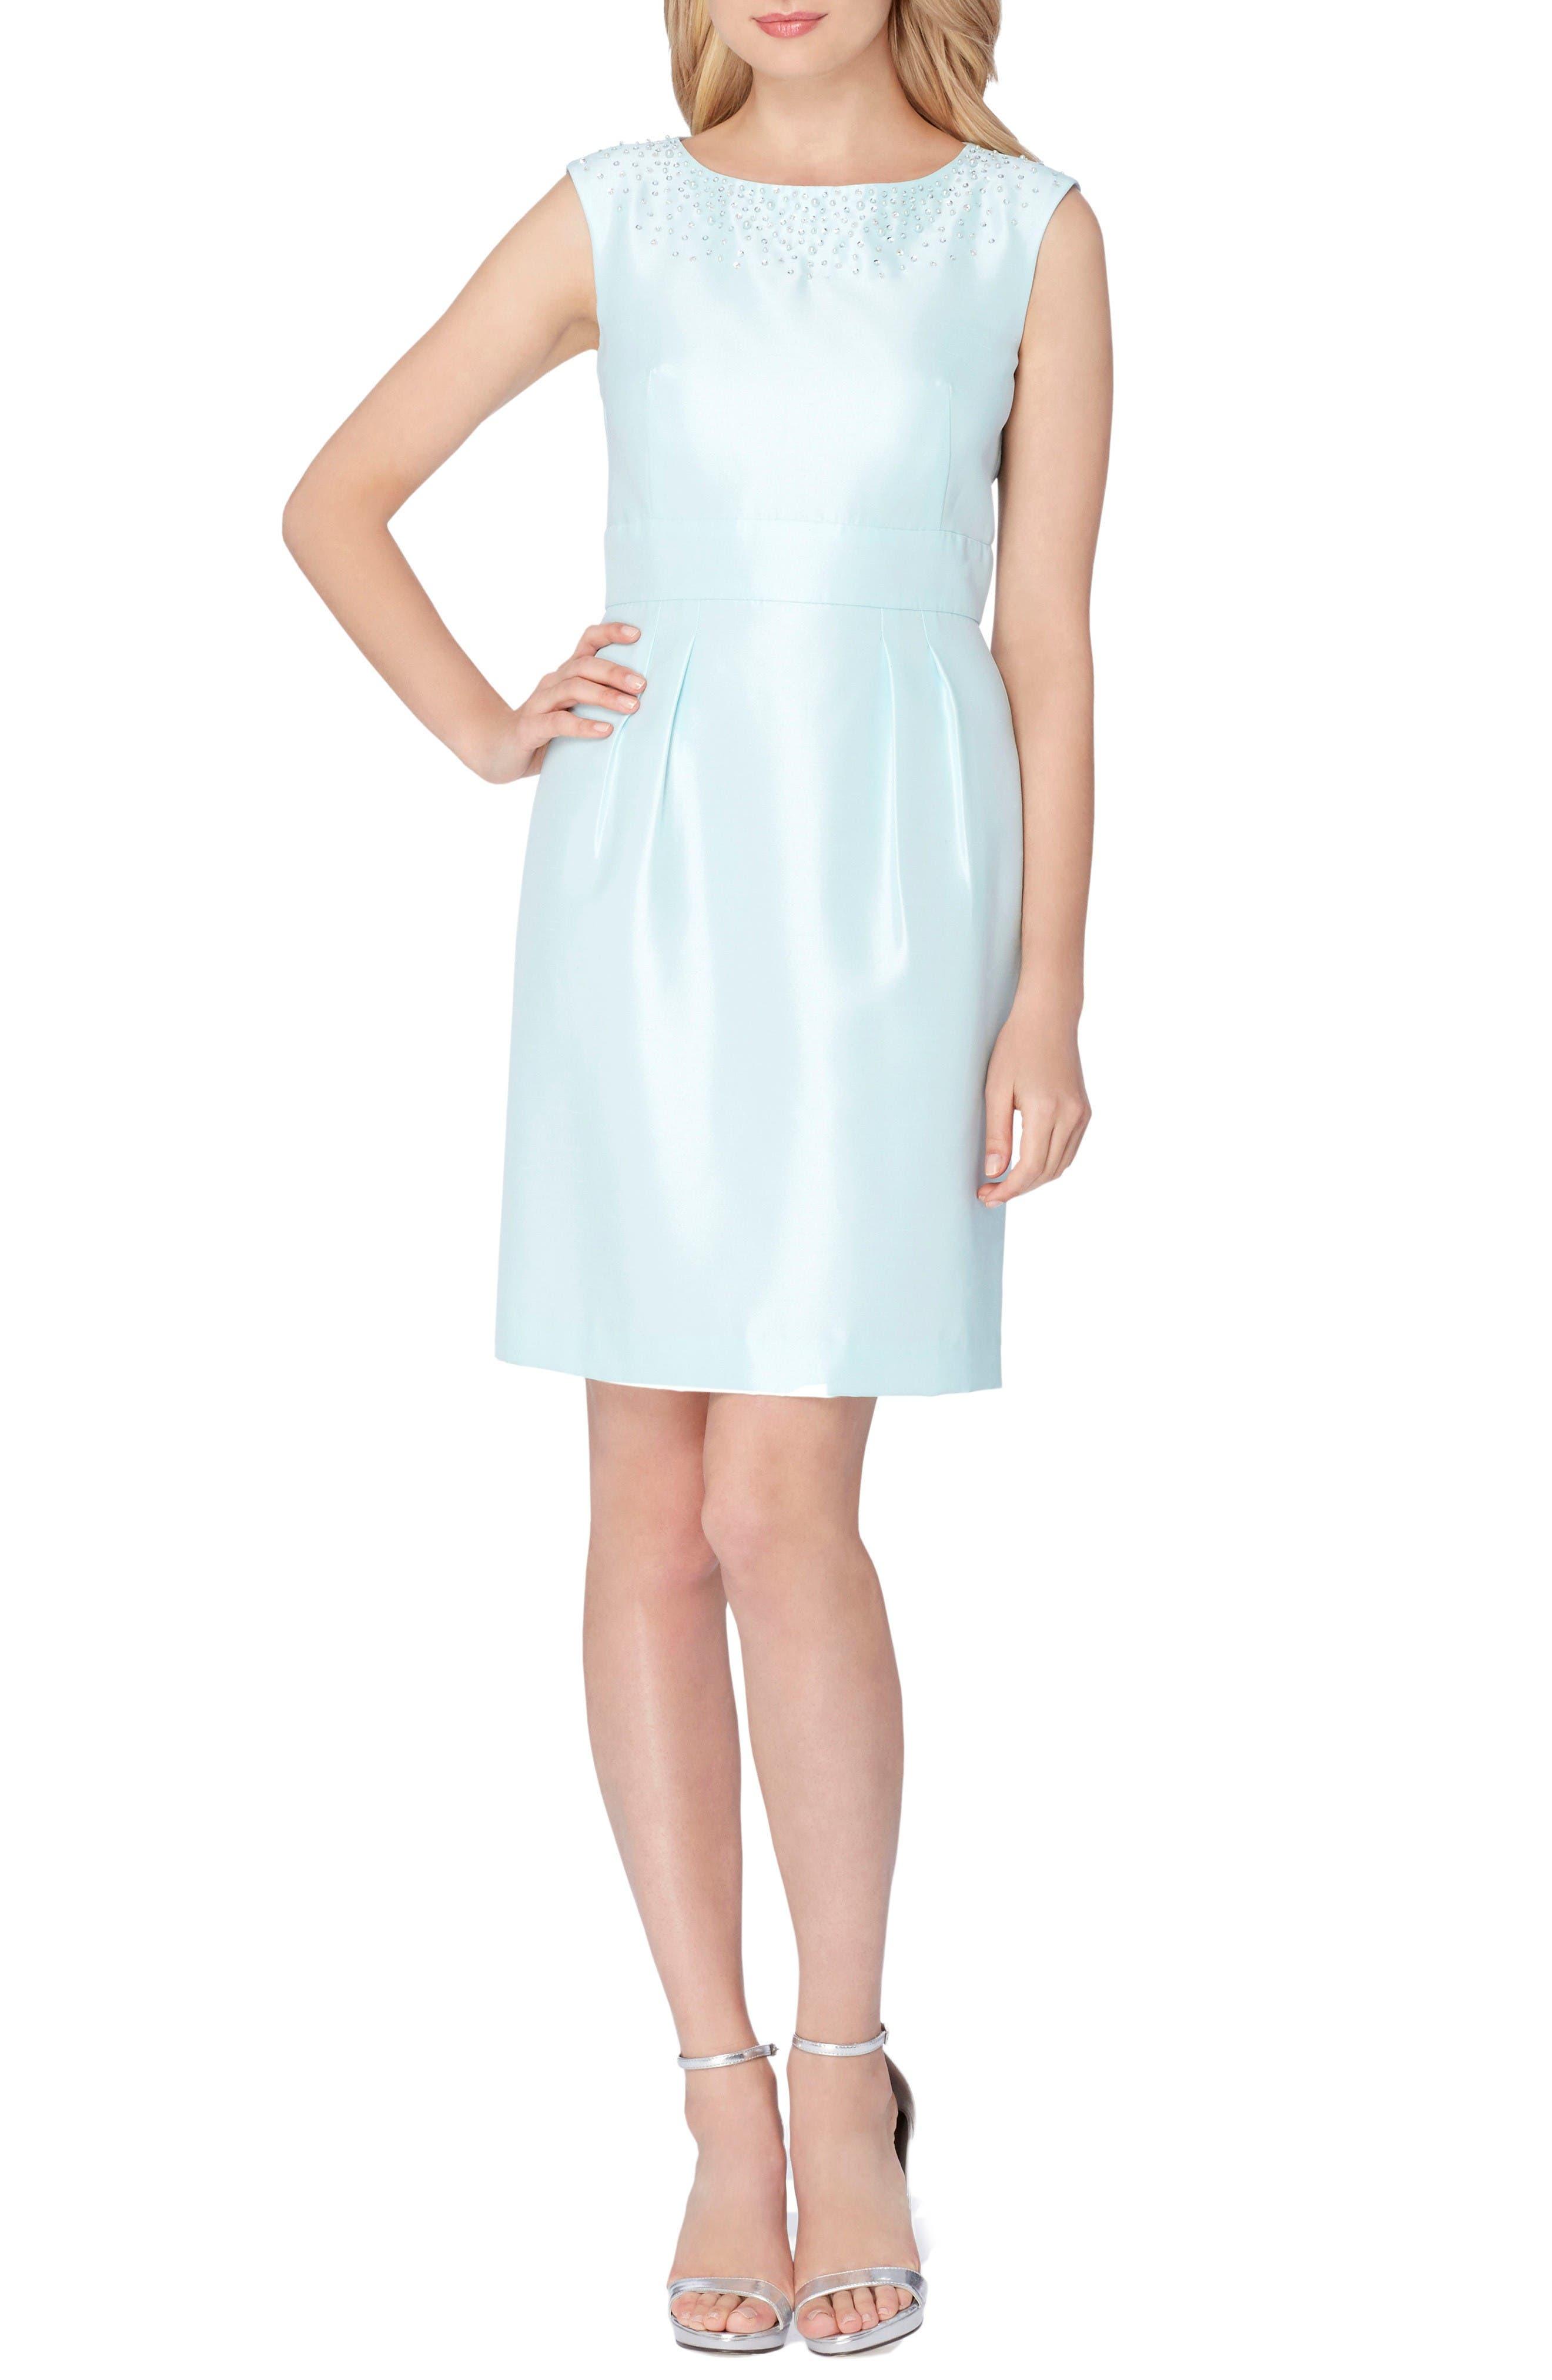 Tahari Embellished Shantung Dress (Petite)